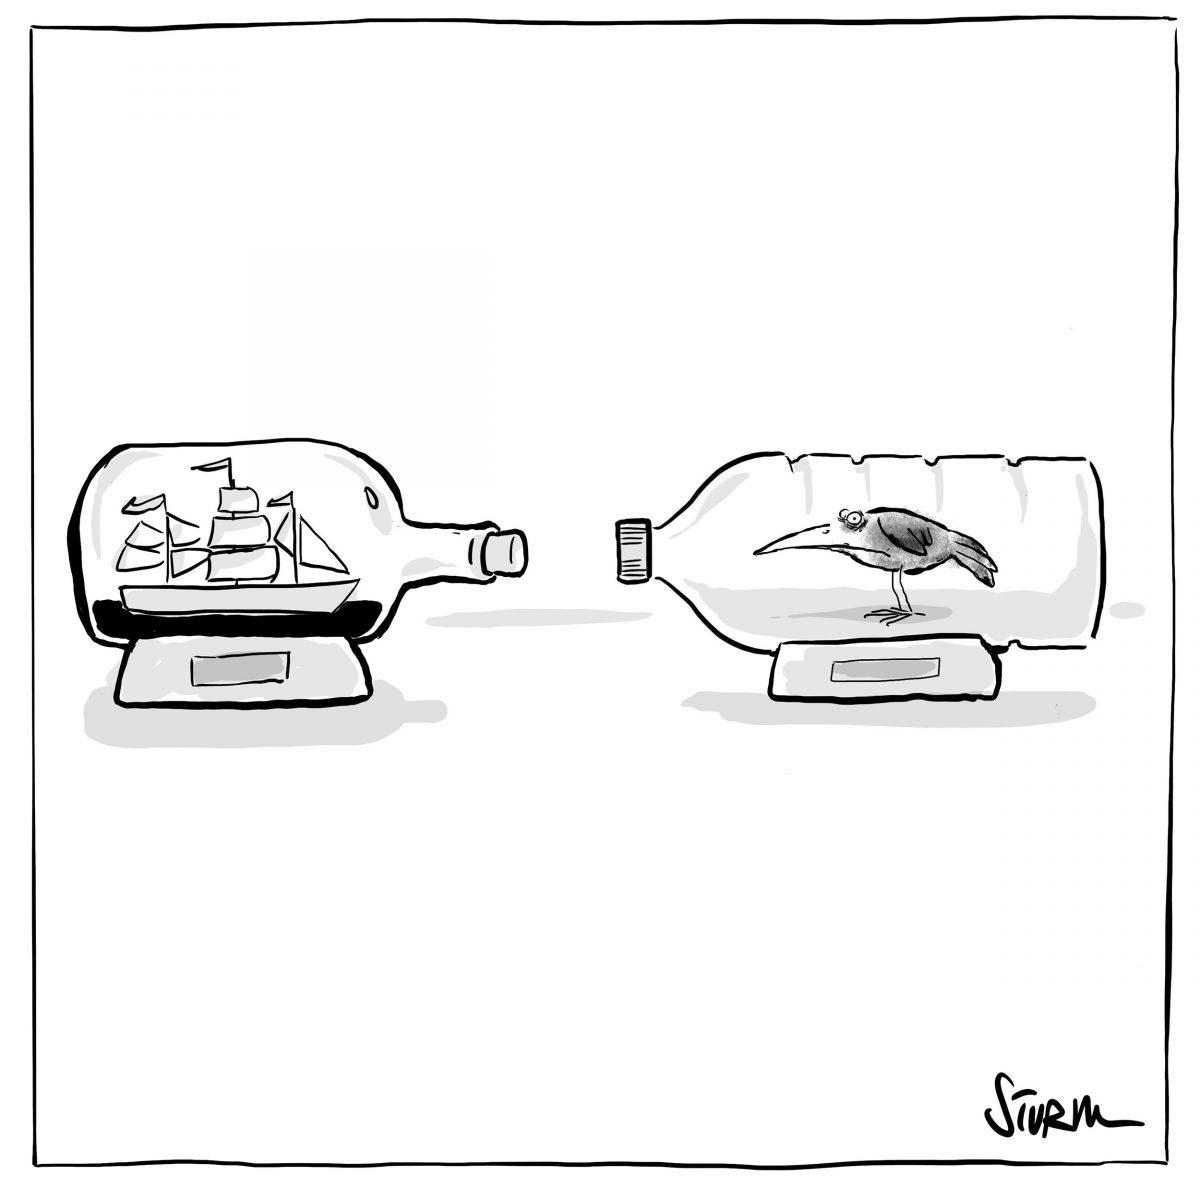 Buddelschiff / Buddelschipp –Cartoon Philipp Sturm